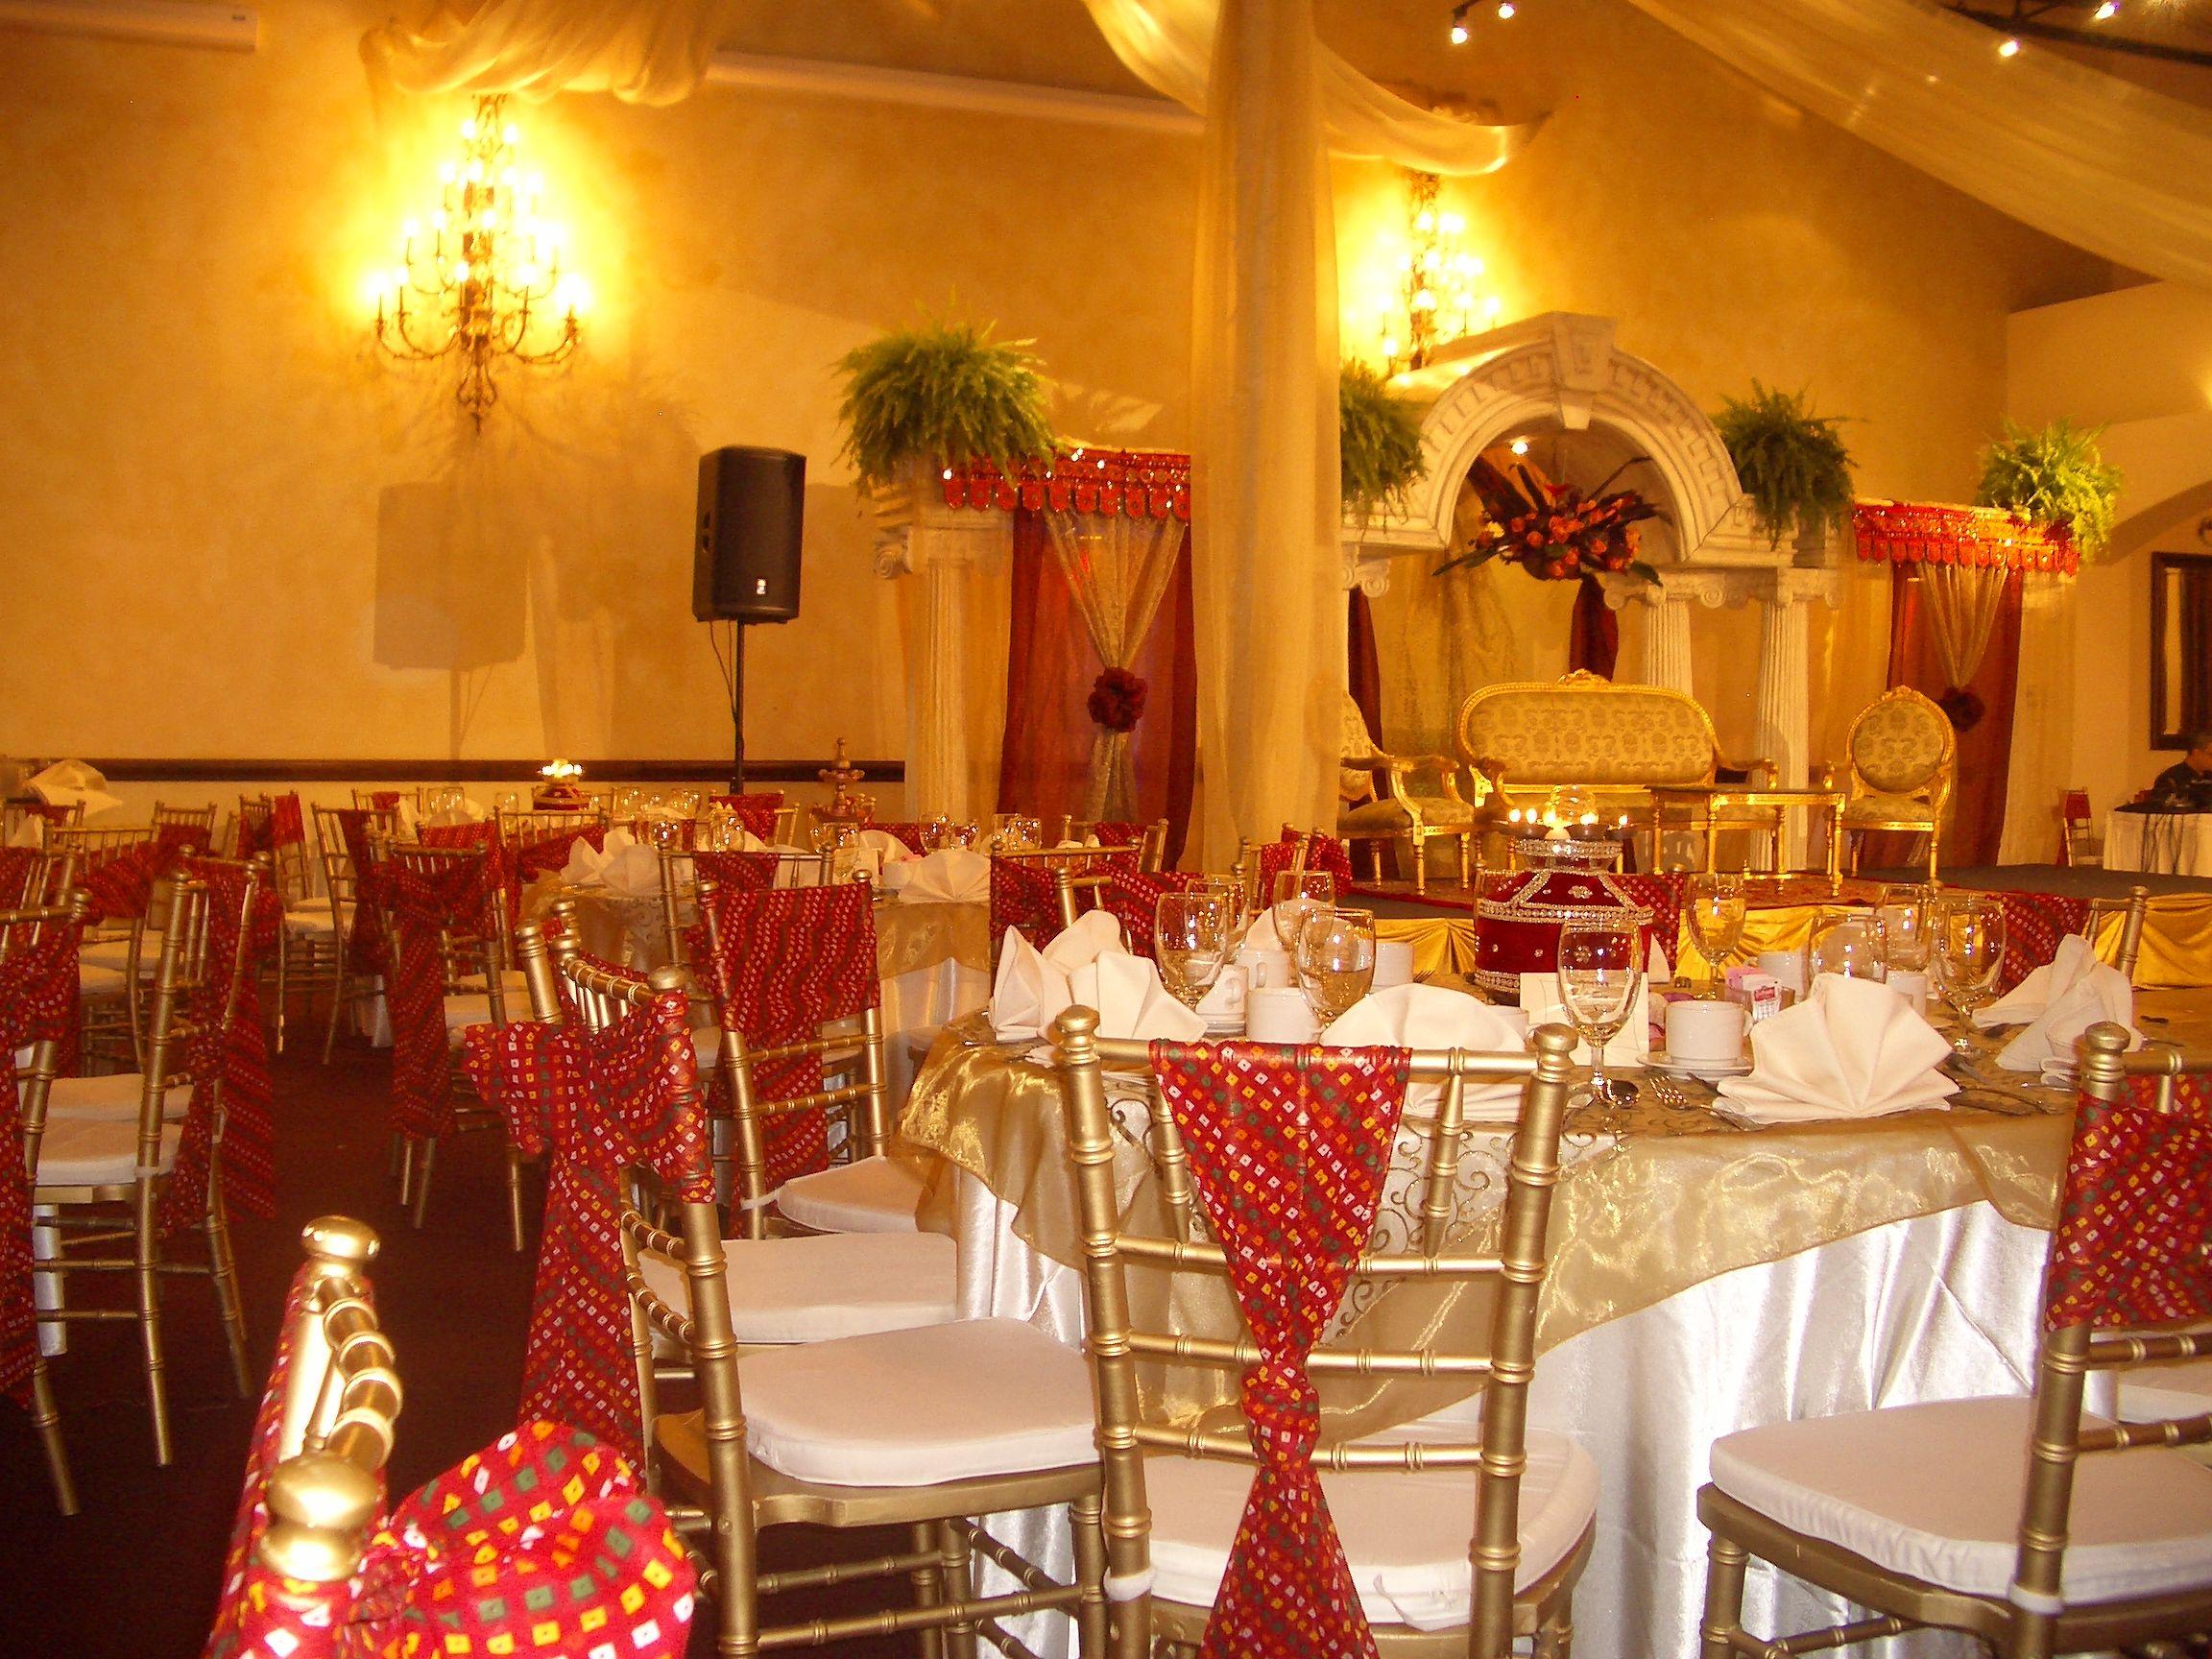 At pelazzio fullservice wedding special events venue